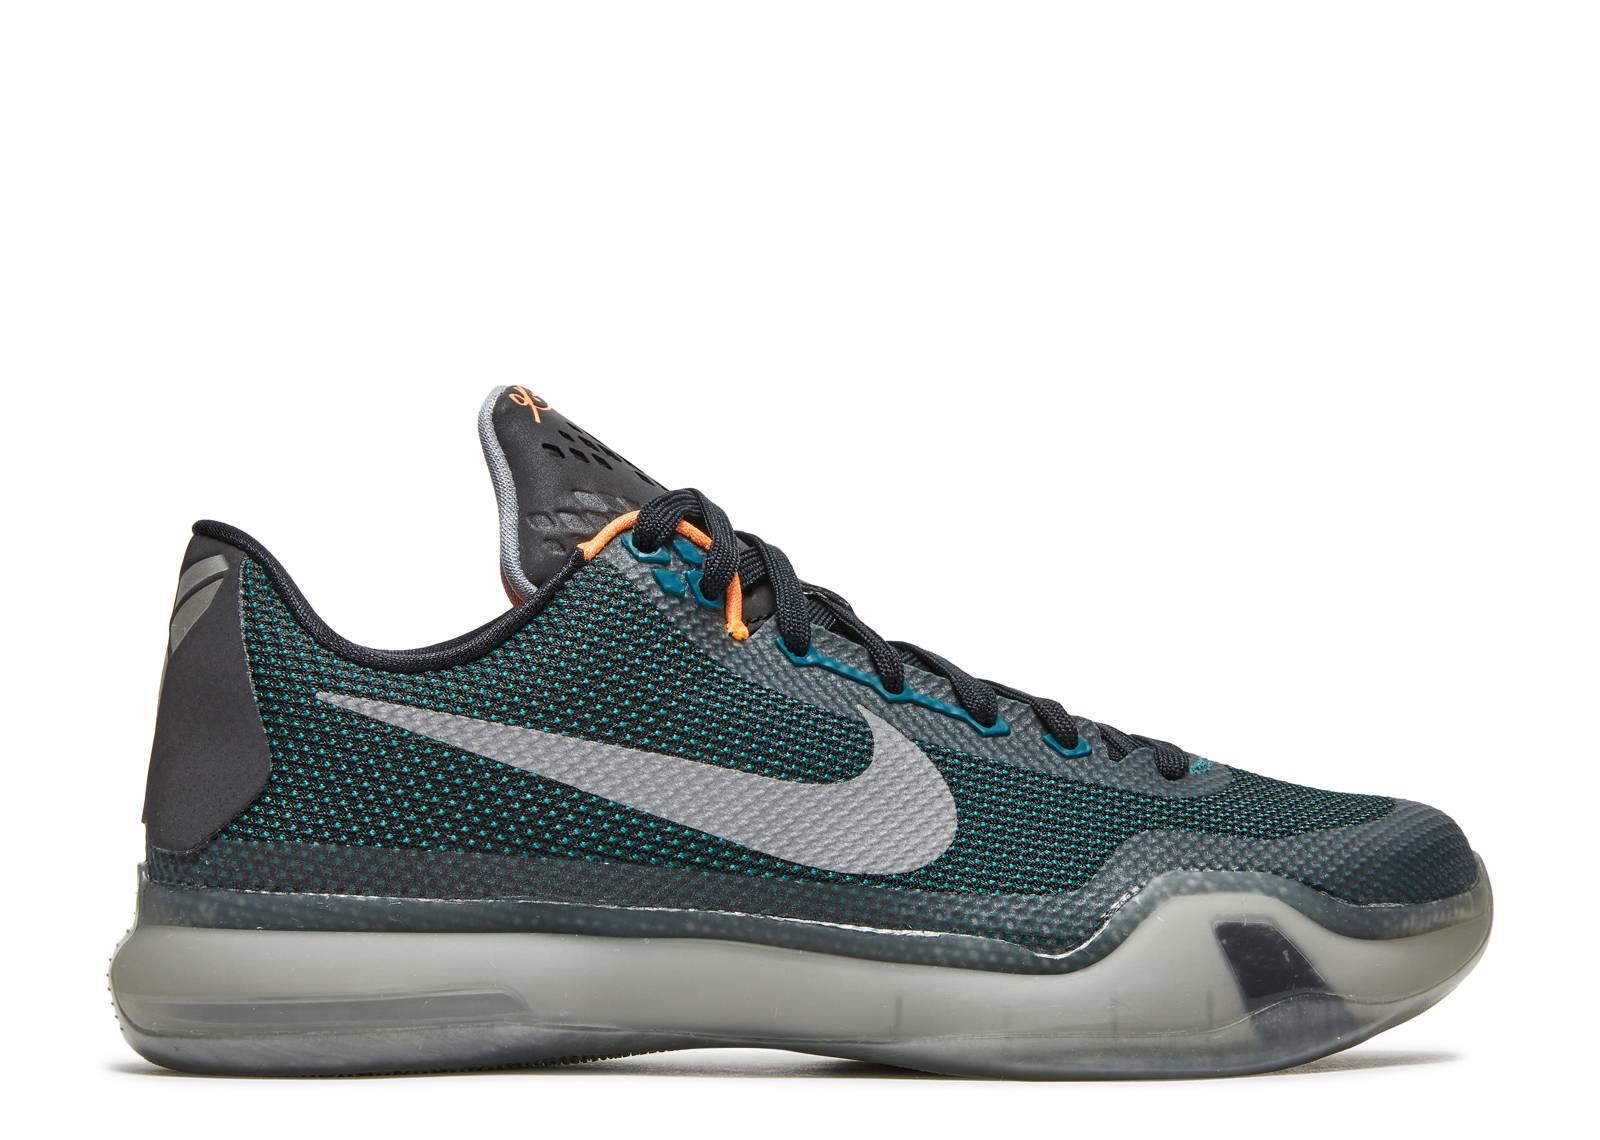 quality design 76498 4c74d Kobe 10 - Nike - 705317 308 - teal rflct silver-blck-wlf gru ...